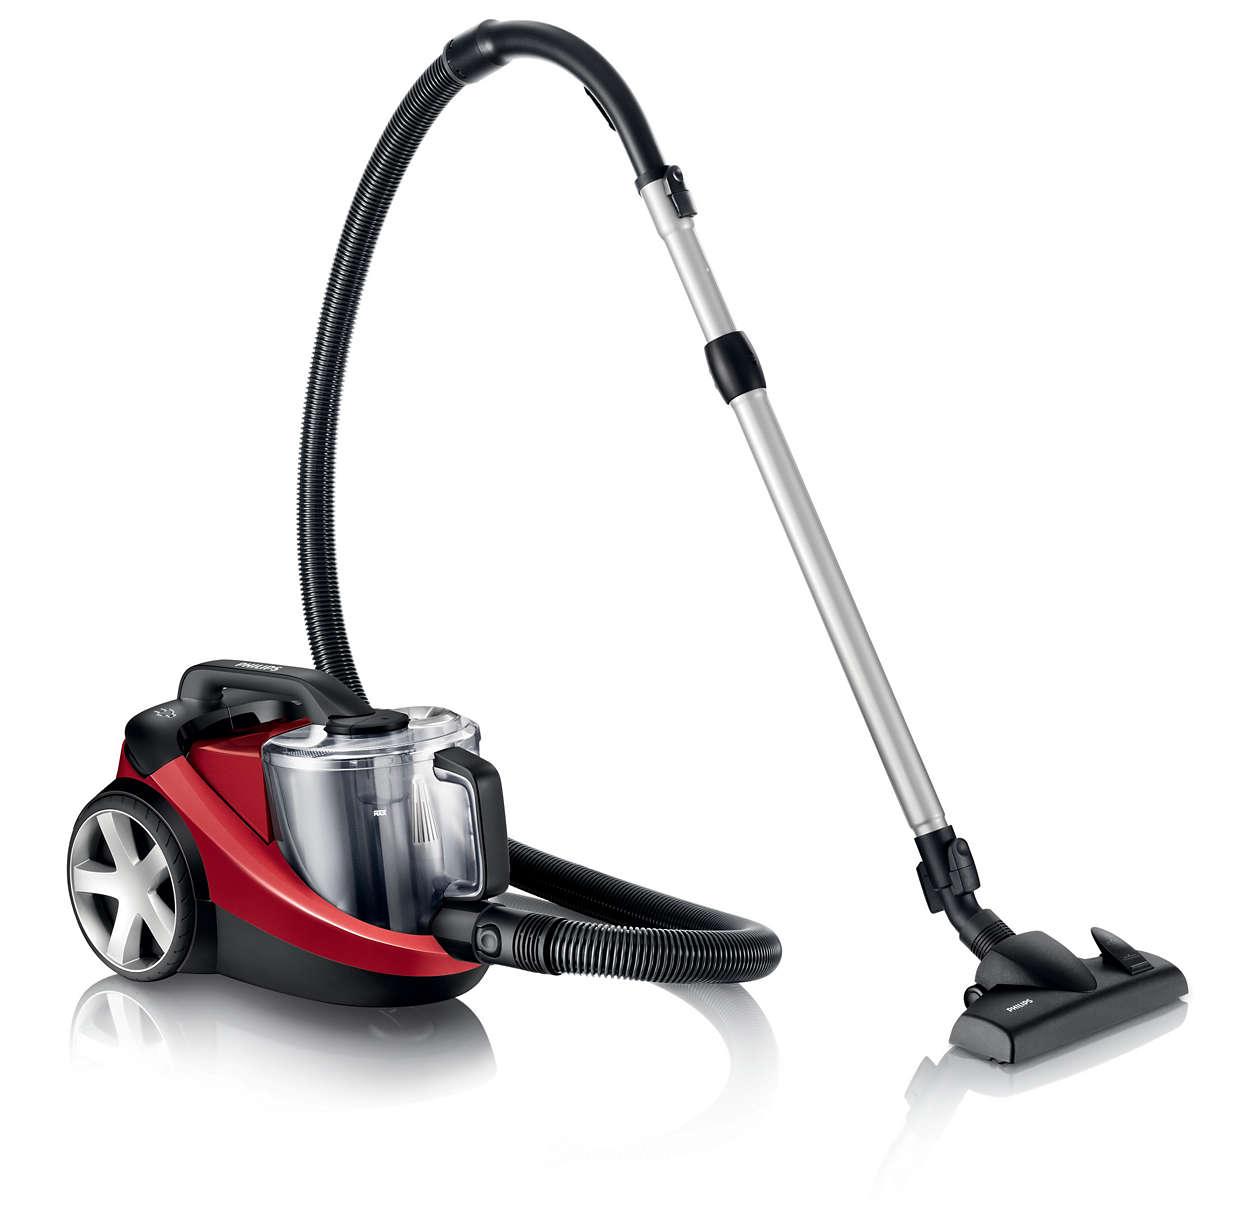 Powerpro Bagless Vacuum Cleaner Fc8760 01 Philips